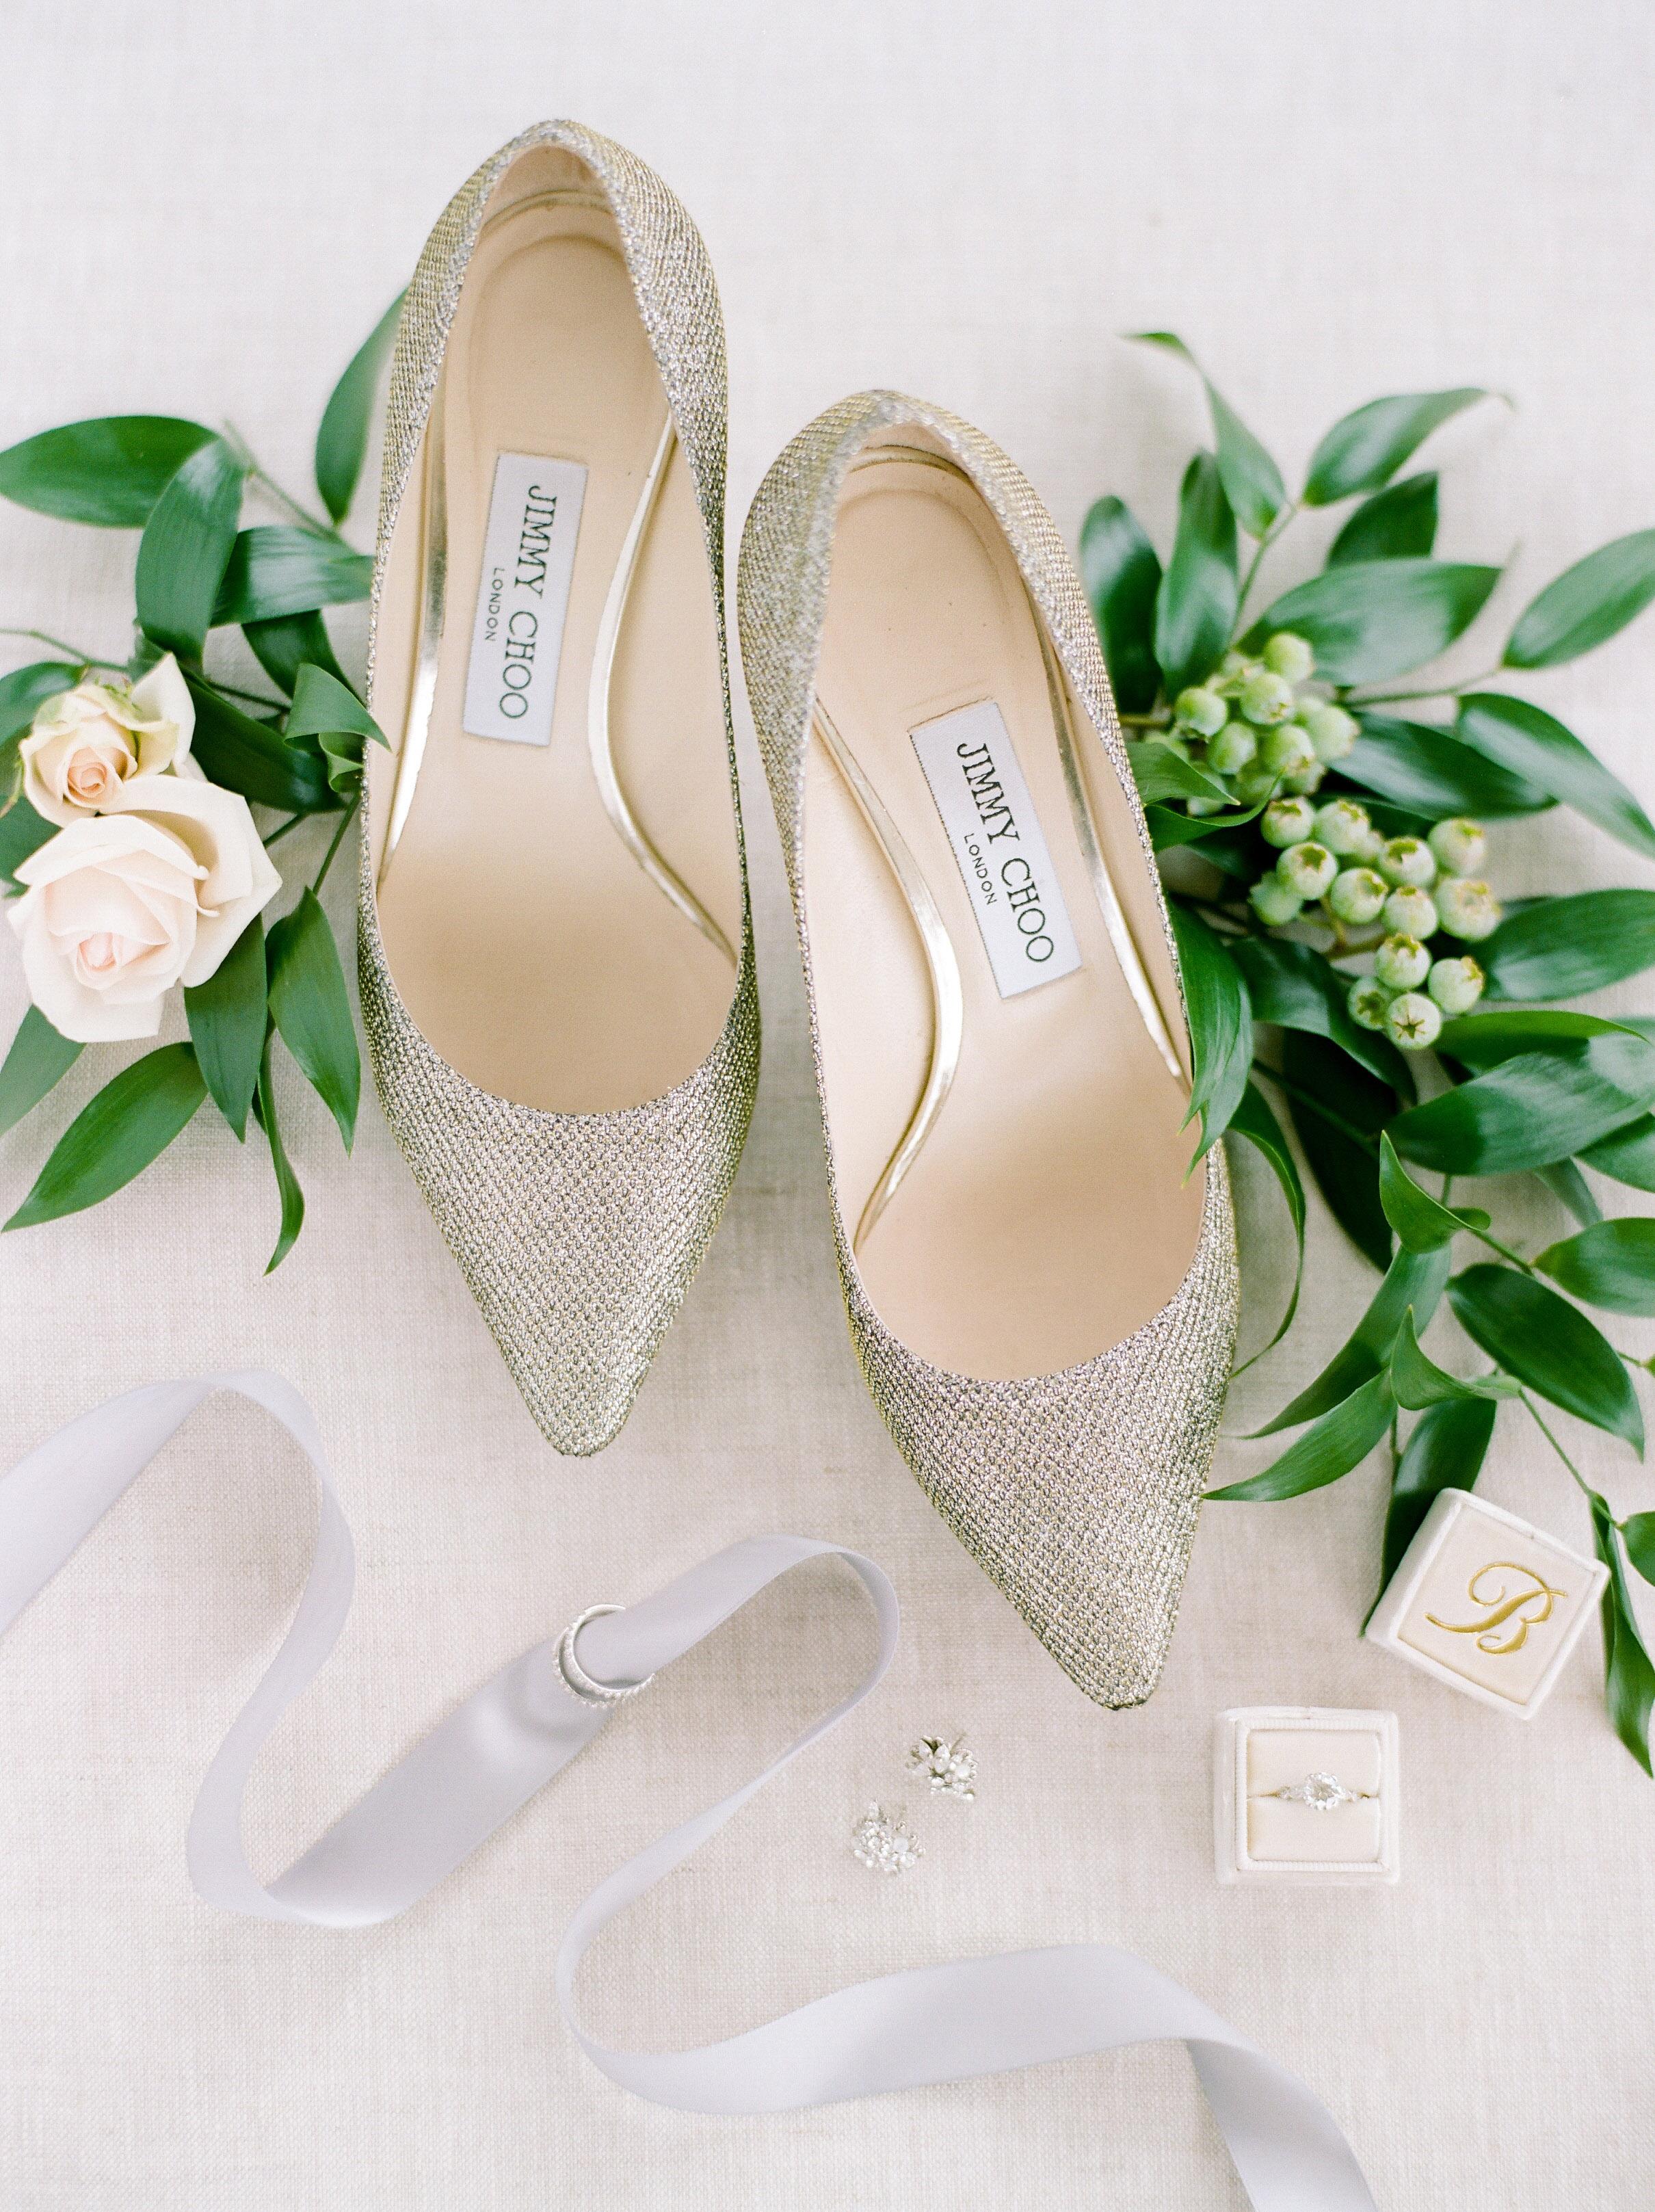 houston-wedding-planner-fine-art-luxury-designer-top-best-destination-austin-dallas-kelly-doonan-events-river-oaks-country-club-1